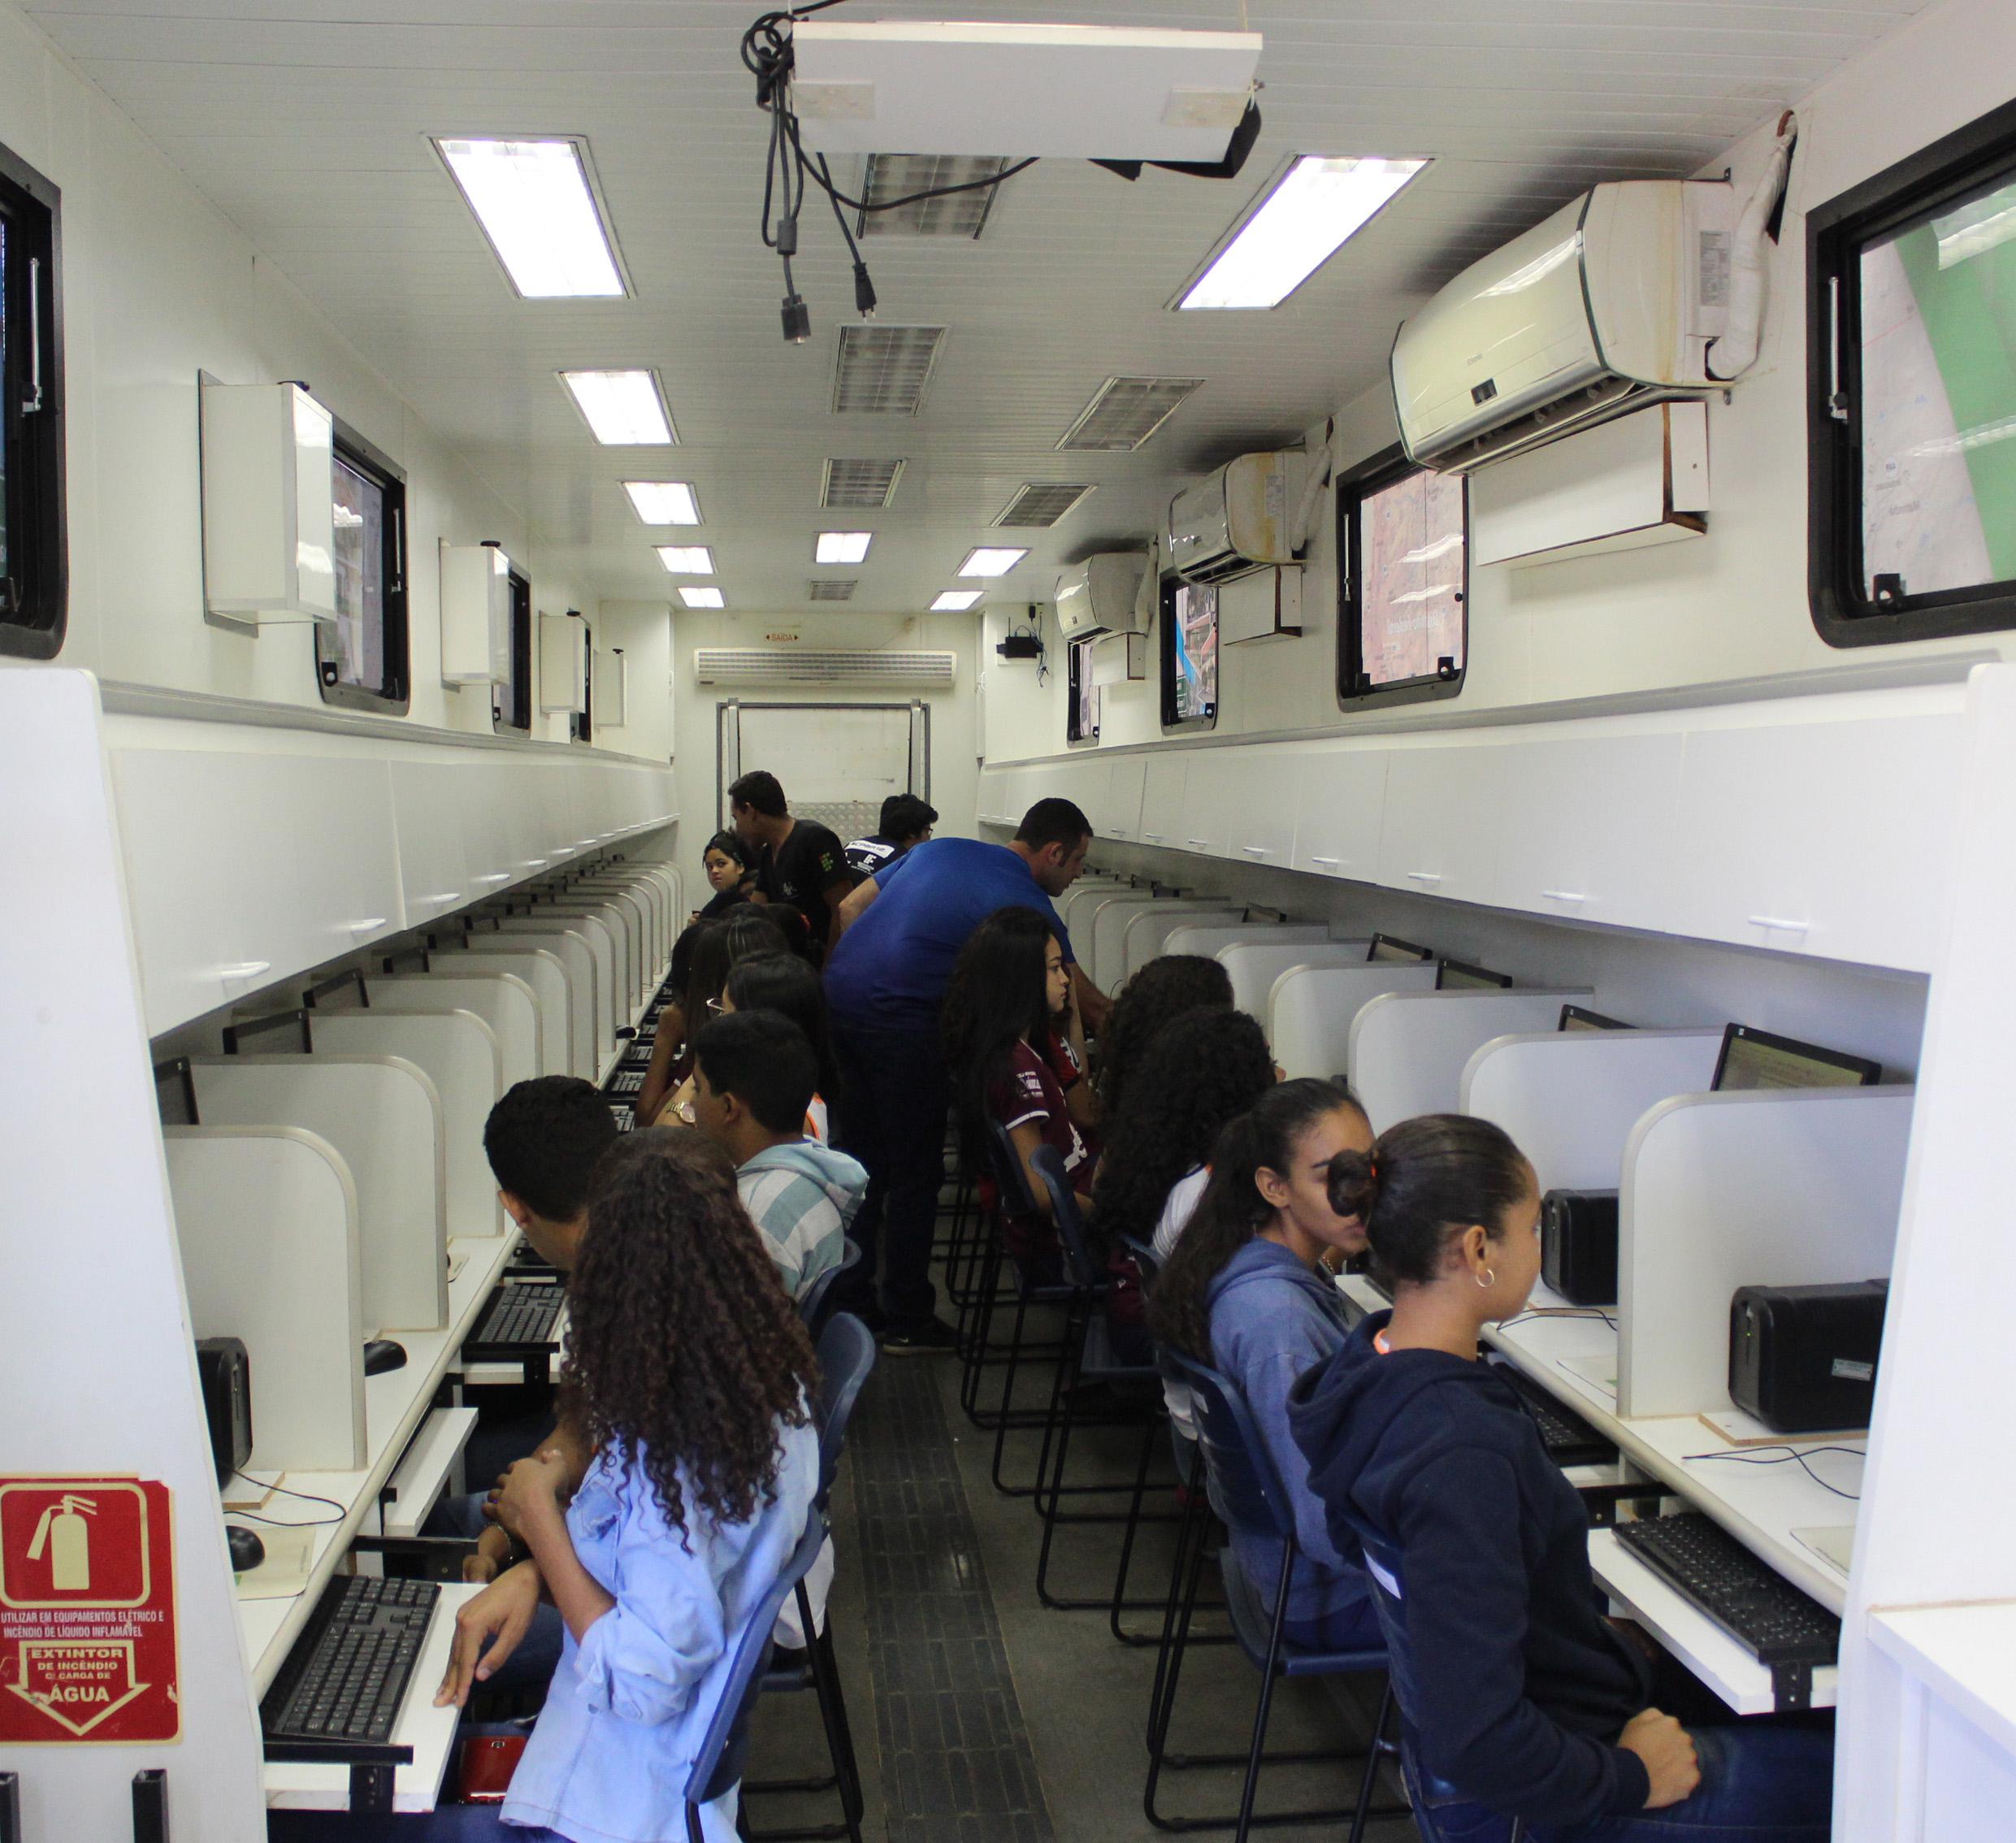 Carreta-laboratório do IFNMG